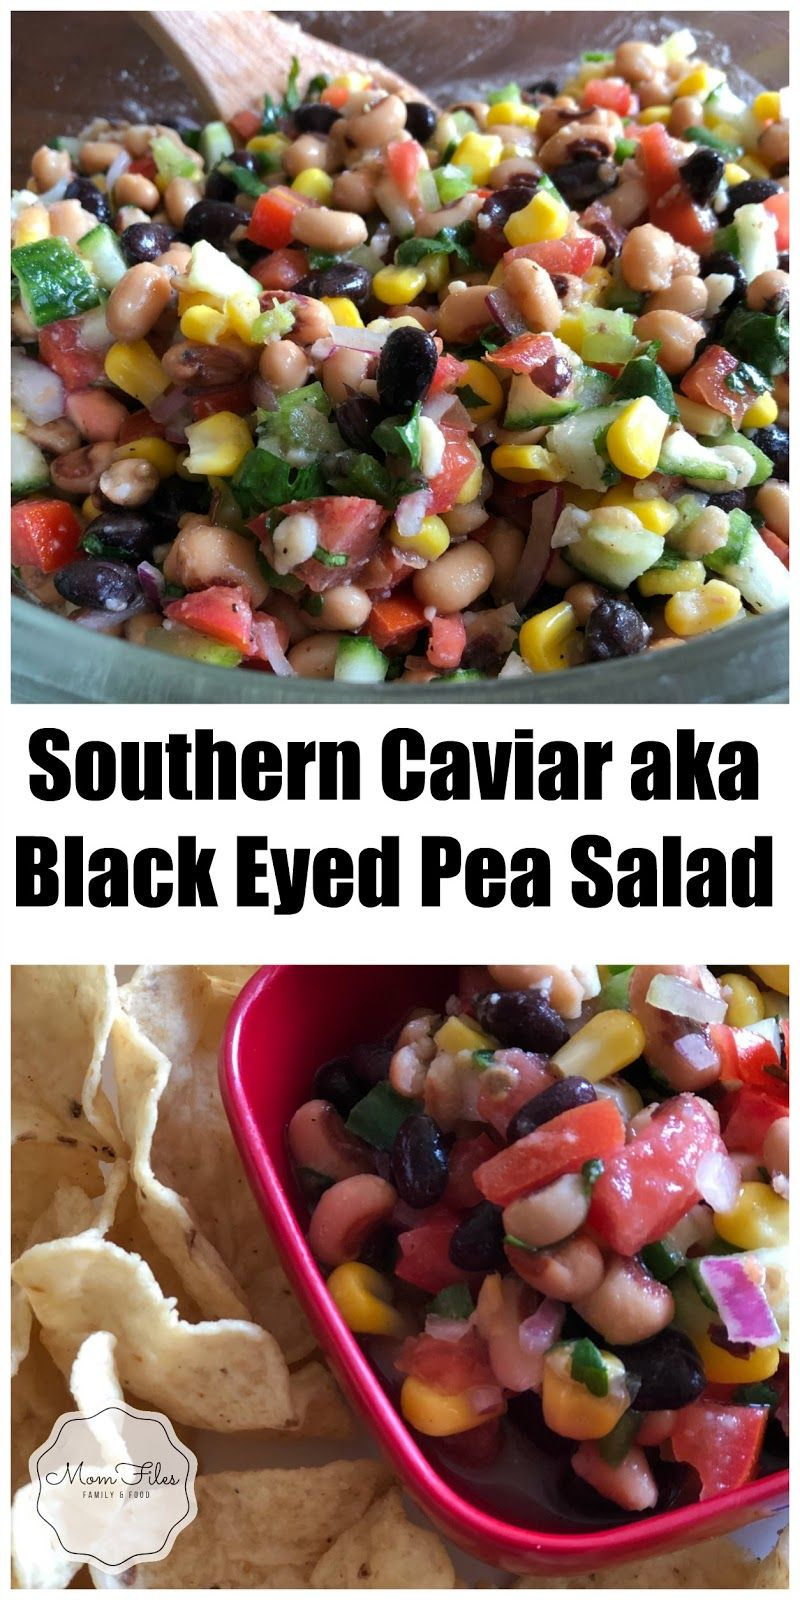 Southern Caviar aka Black Eyed Pea Salad Recipe